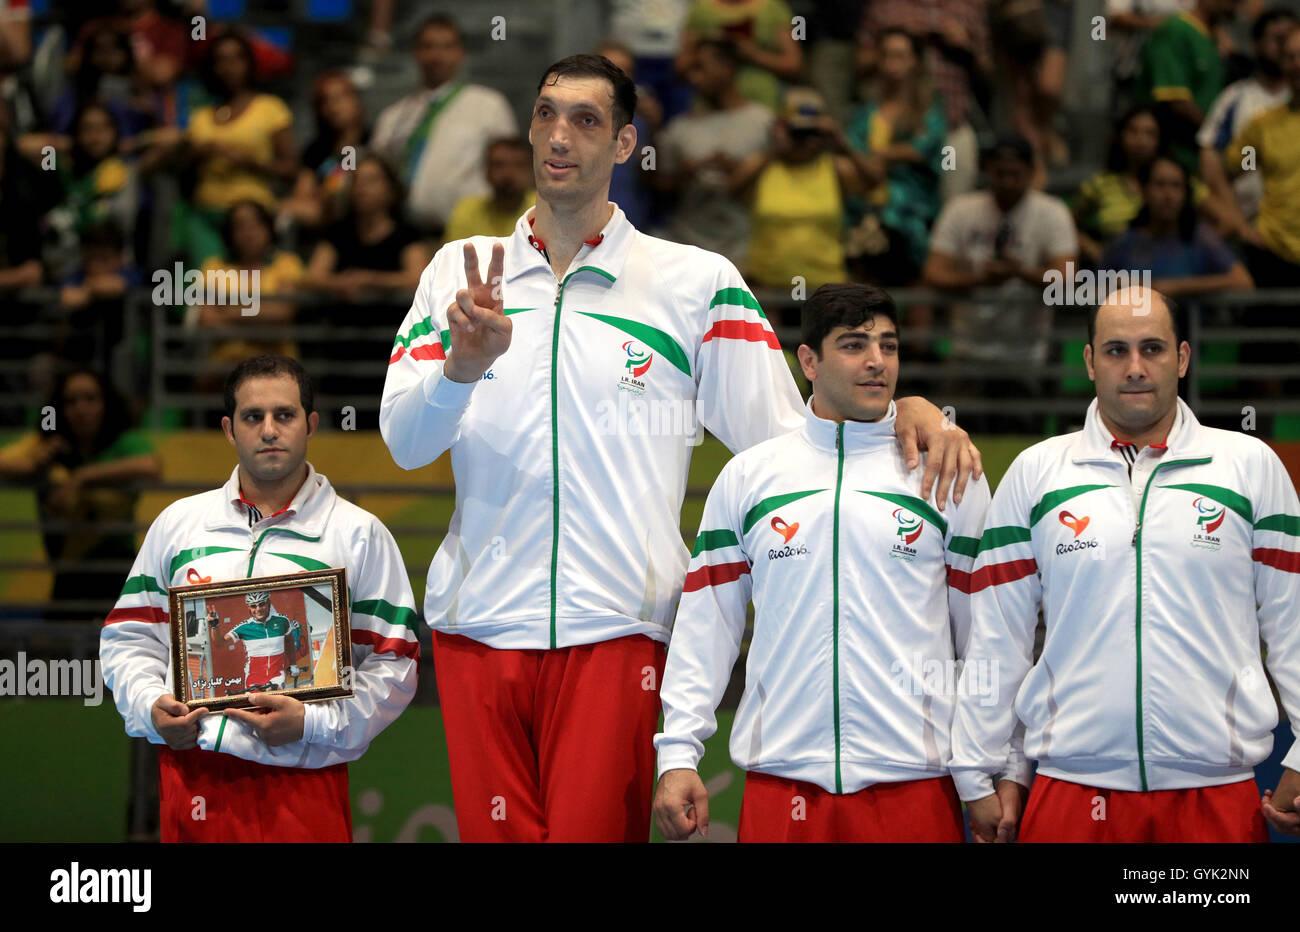 ¿Cuánto mide Sultan Kösen? - Altura - Real height Irans-morteza-mehrzadselakjani-second-left-celebrates-winning-the-GYK2NN